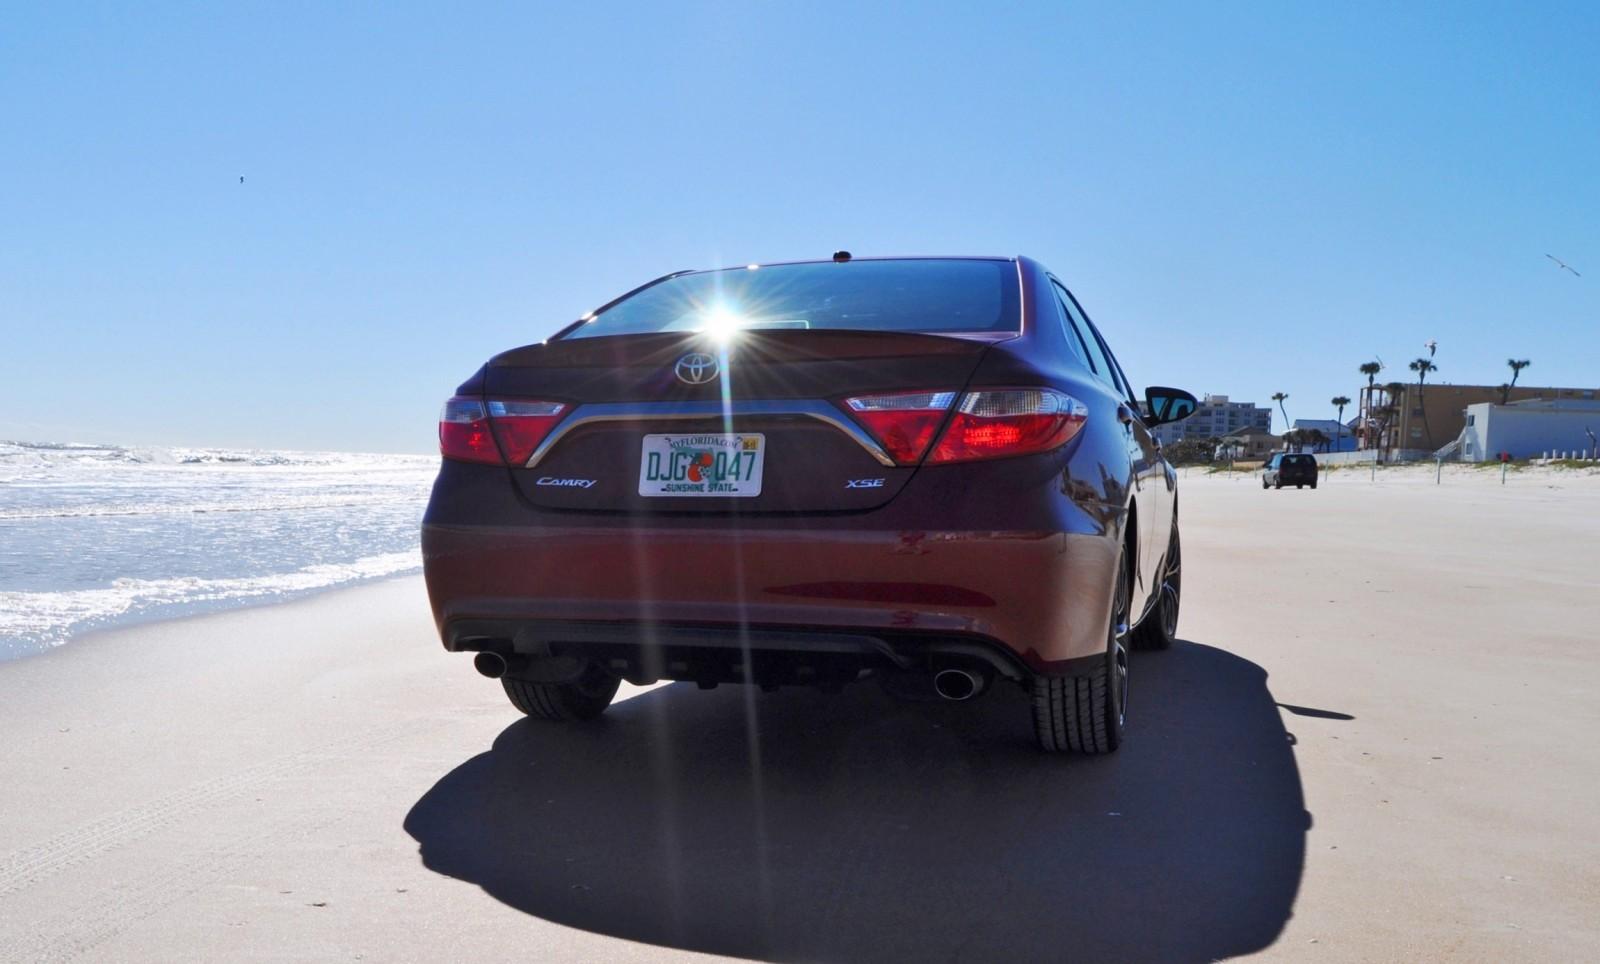 2015 Toyota Camry NASCAR Daytona Beach 67